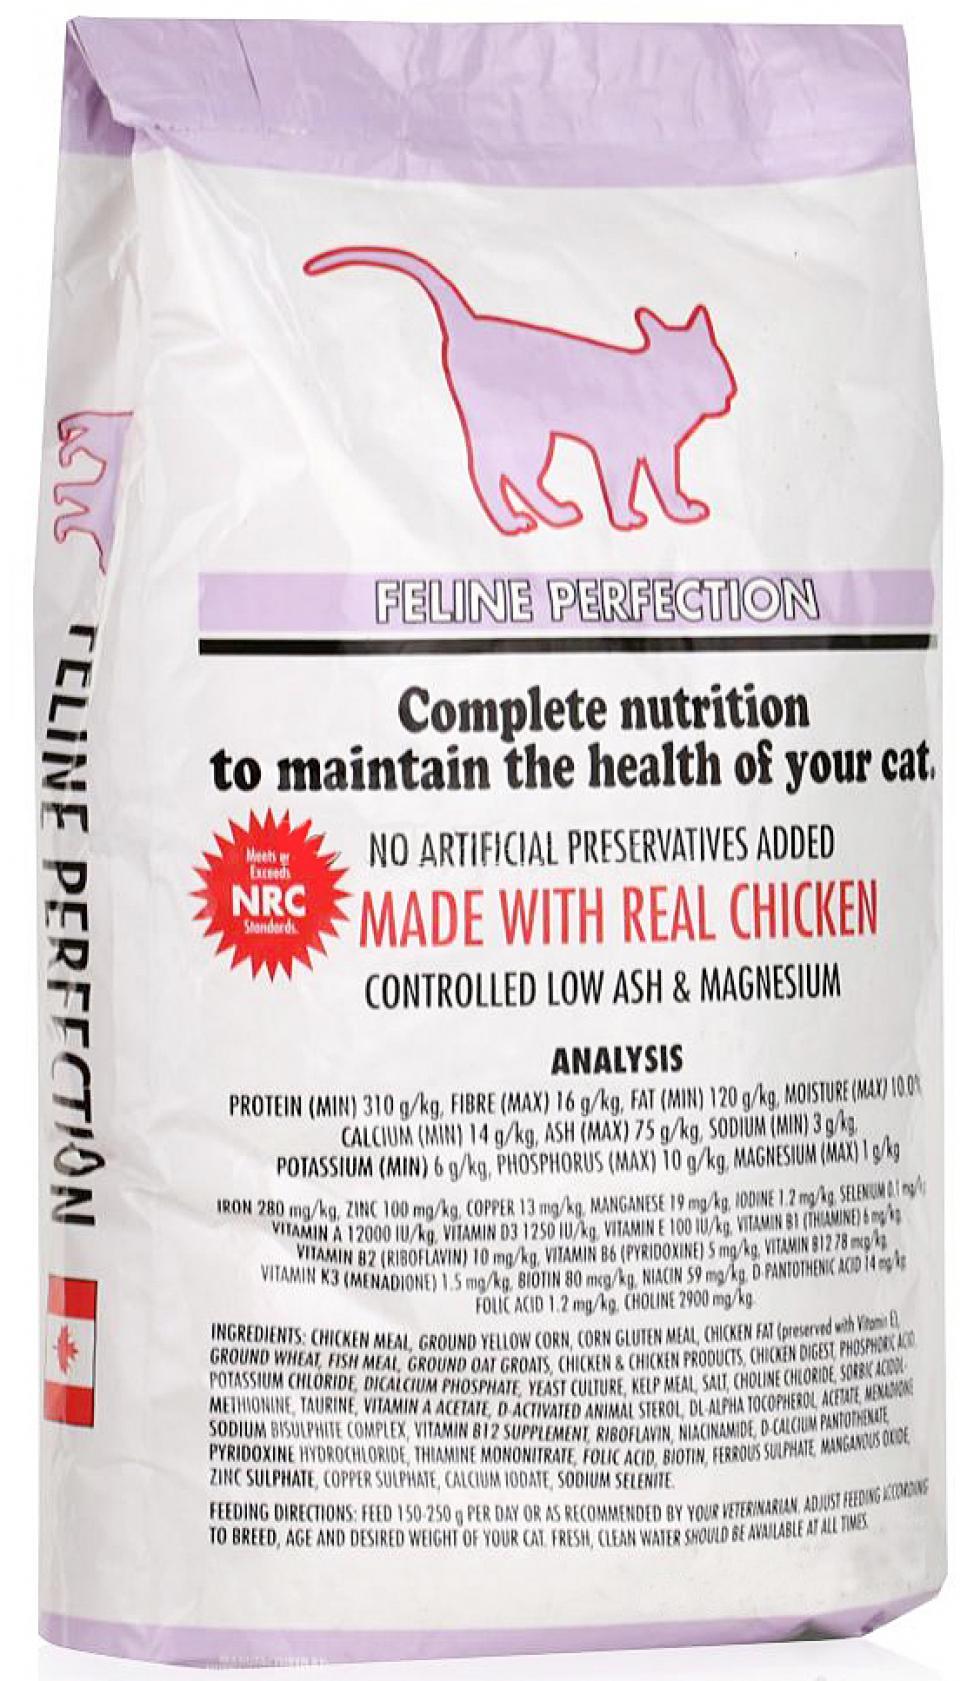 FELINE PERFECTION  корм для кошек профилактика МКБ Курица 400гр, CKK211